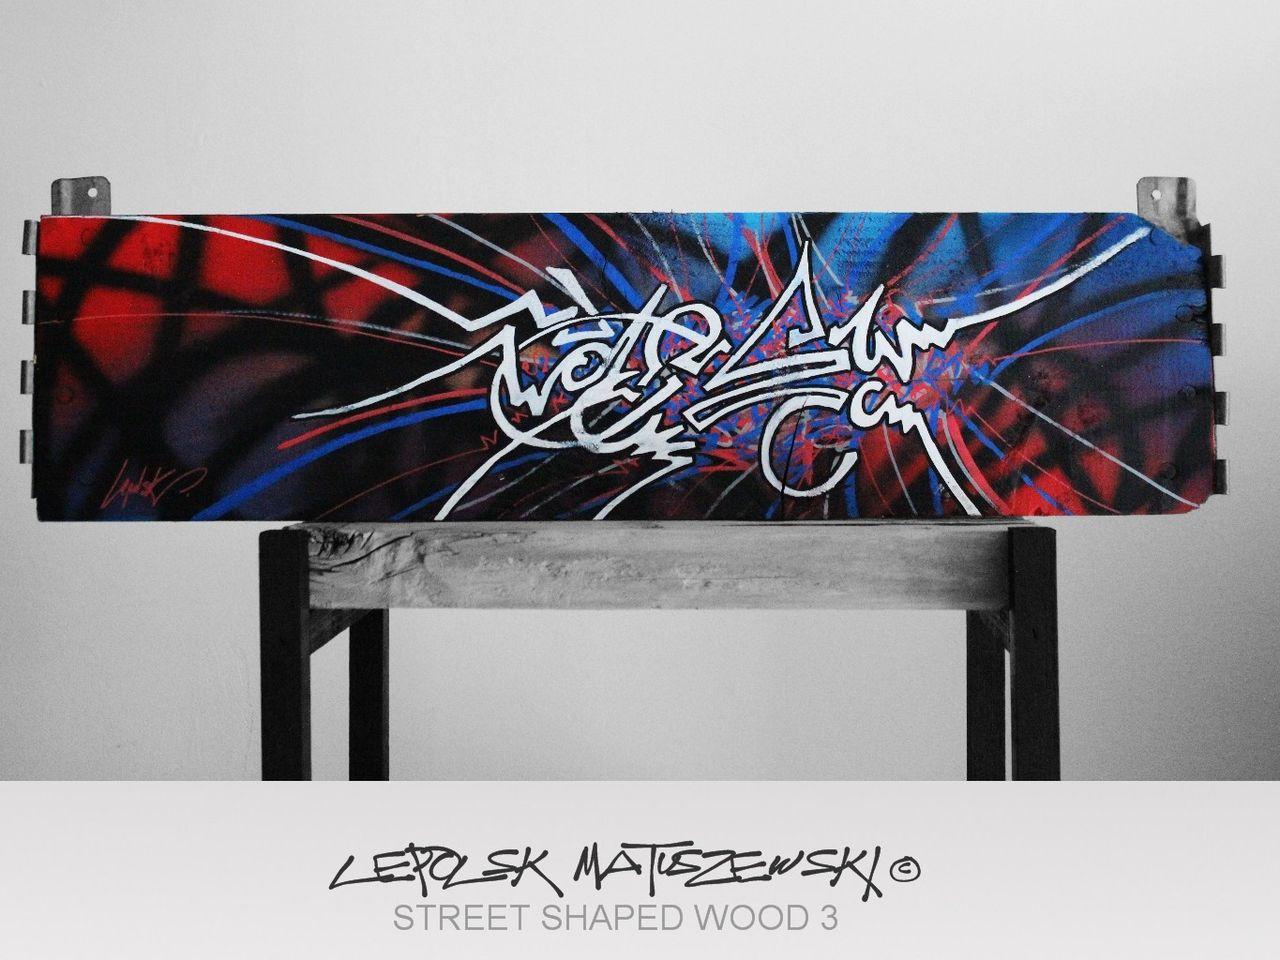 MISTER K  (Lepolsk Matuszewski) STREET SHAPED WOOD 3   street art calligraffiti graffiti abstrait